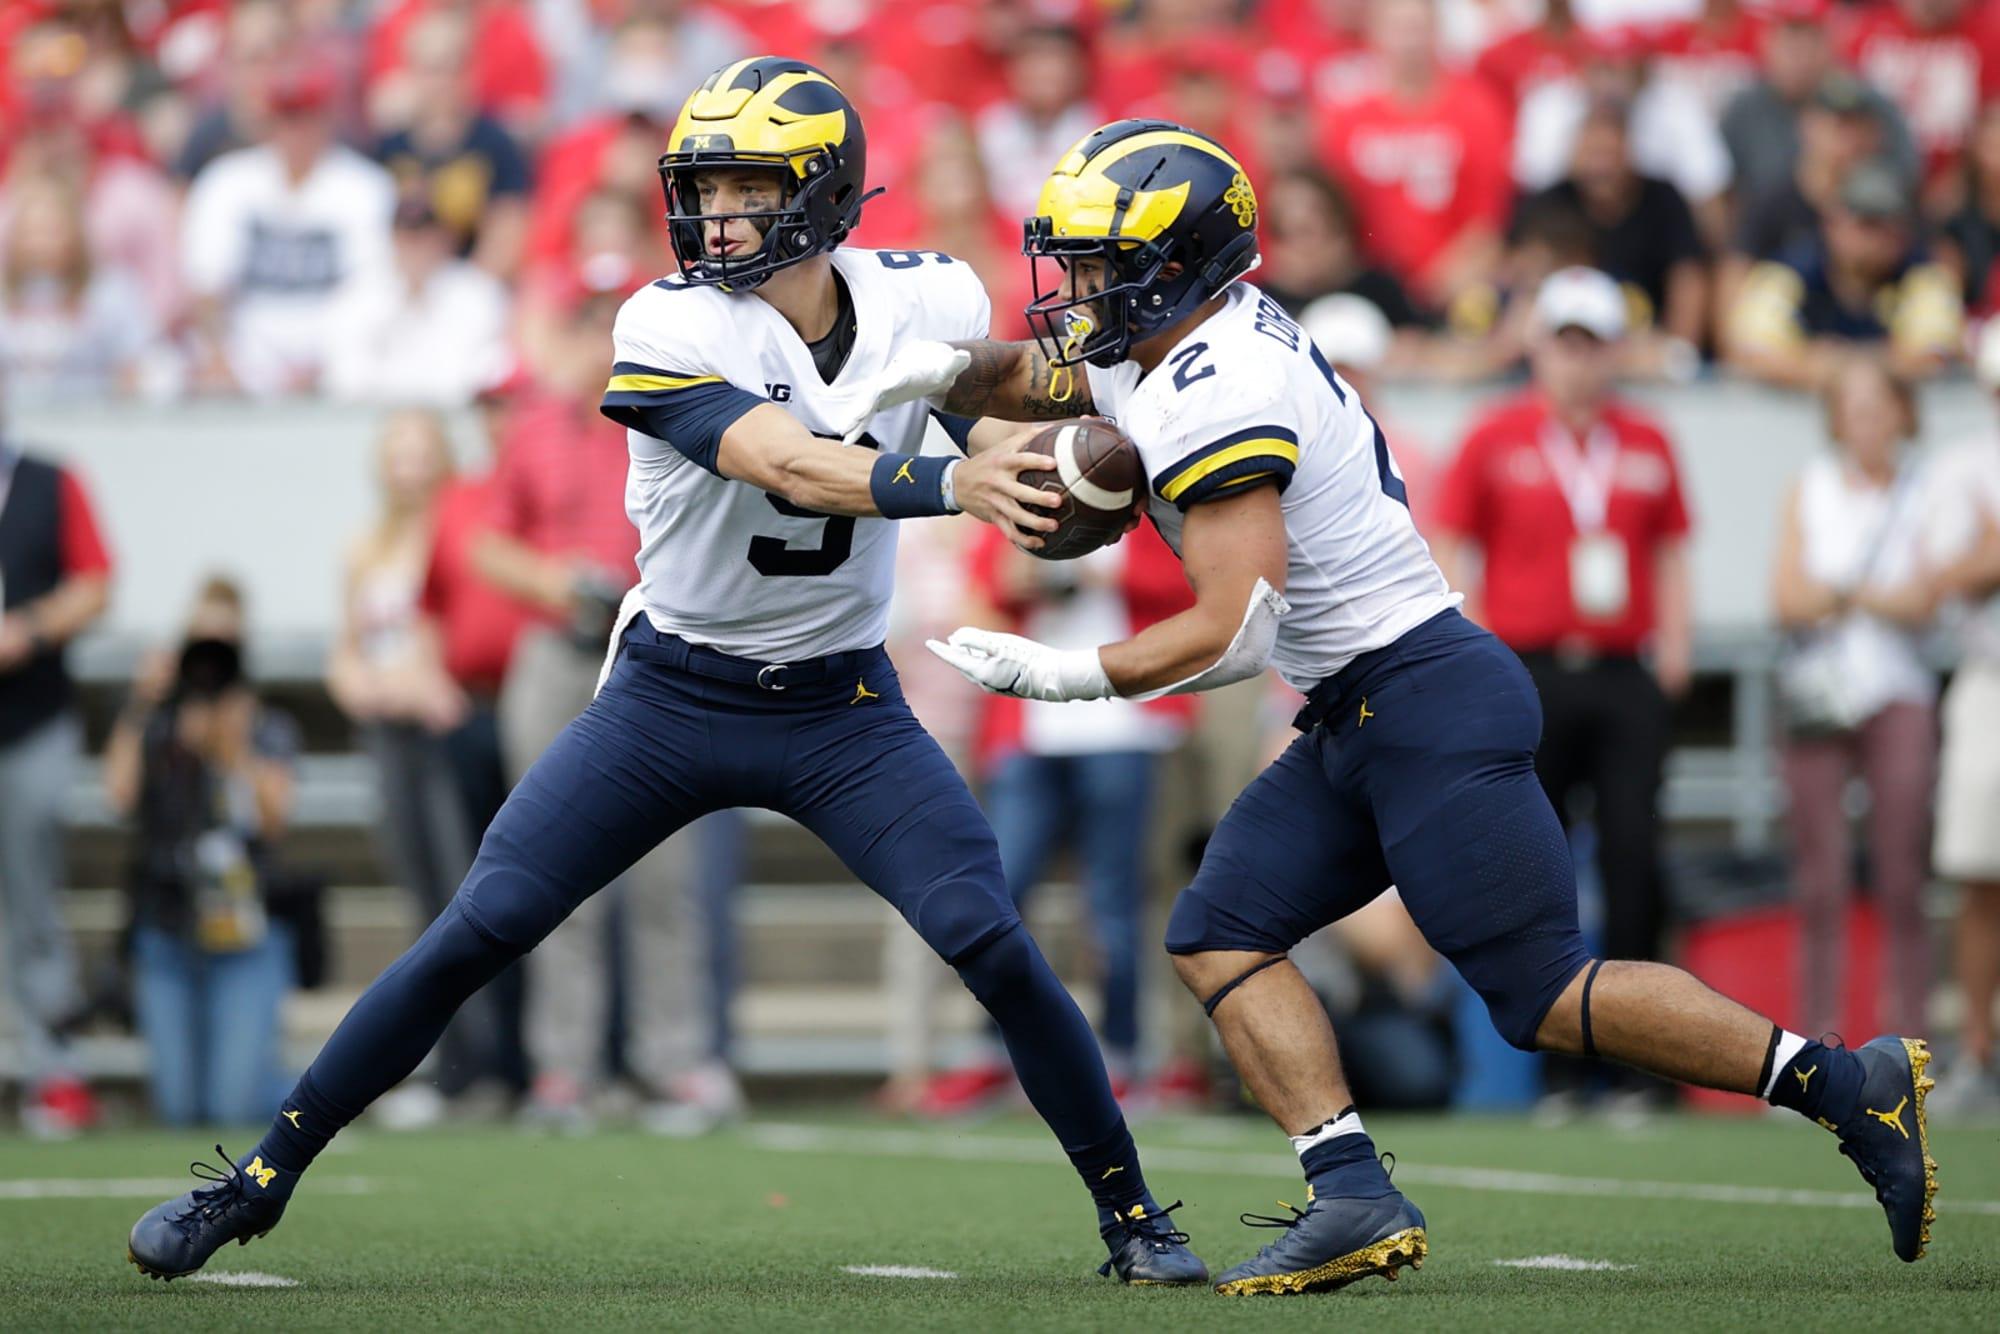 Rich Eisen has a football crush on Michigan freshman quarterback J.J. McCarthy